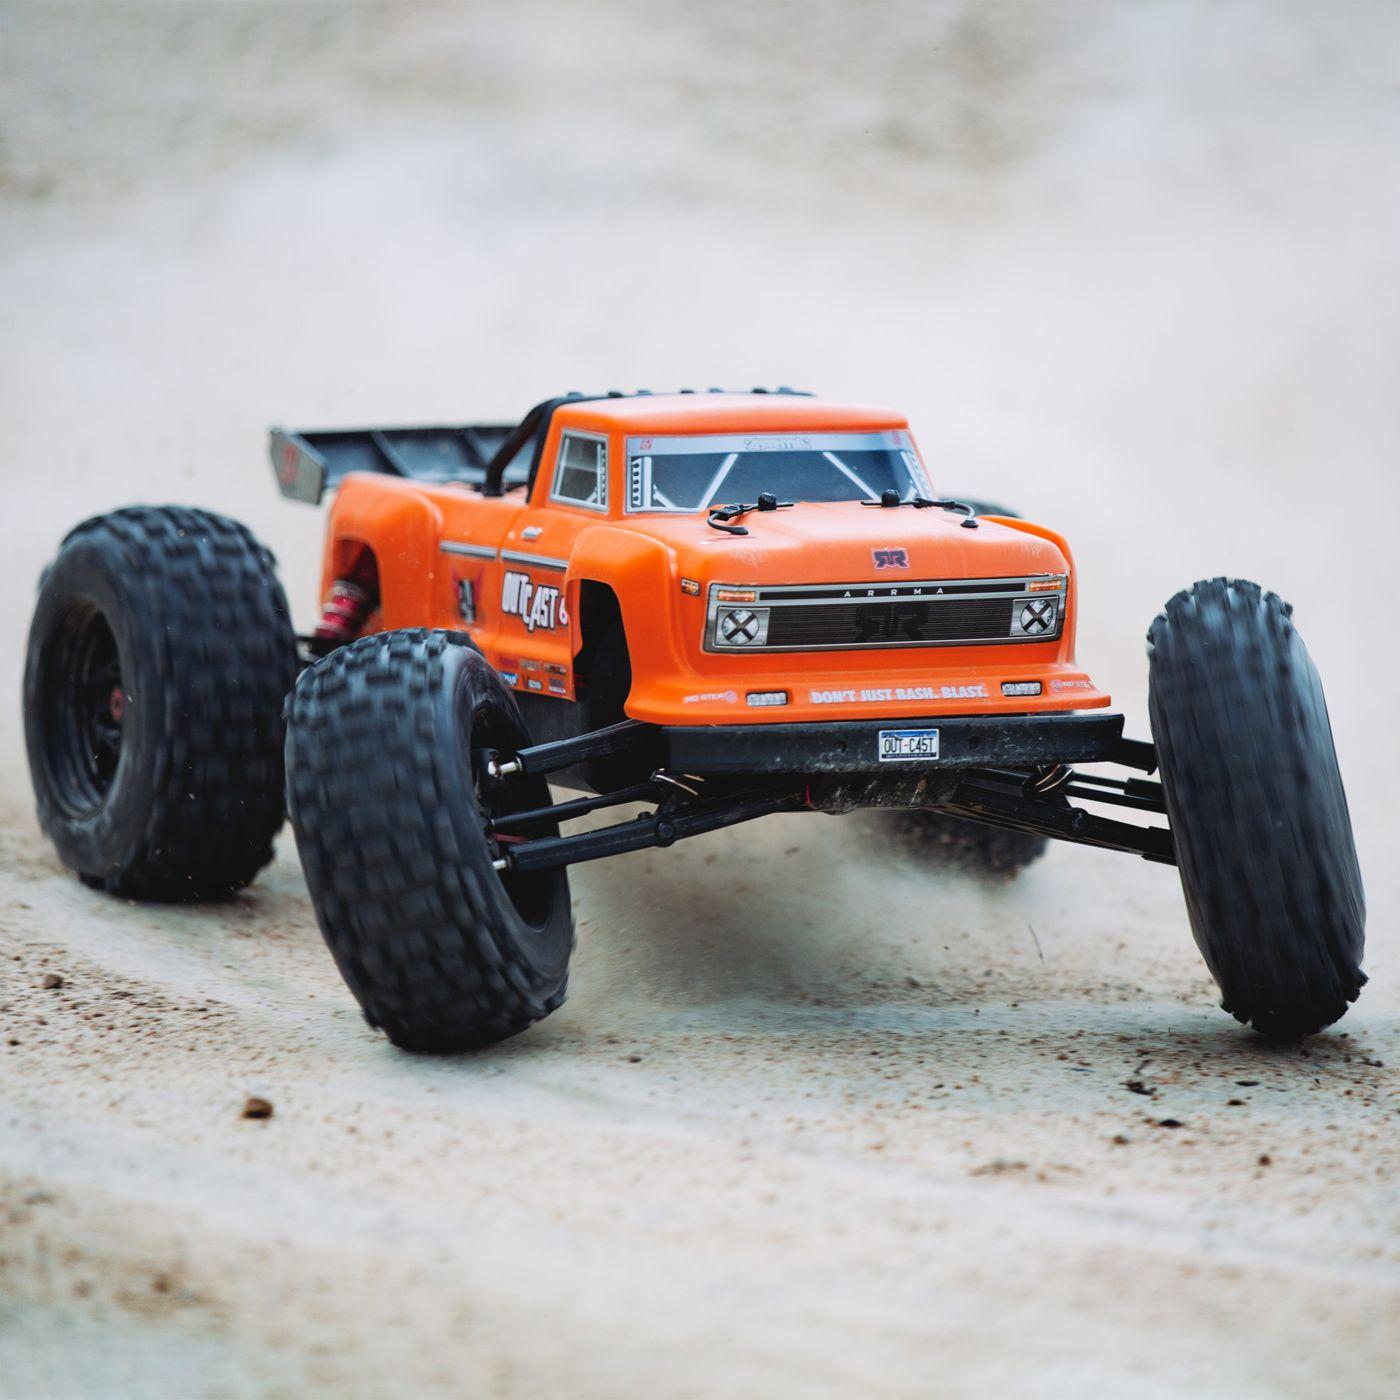 Arrma Outcast 6S BLX 4WD Stunt Truck orange rtr 6